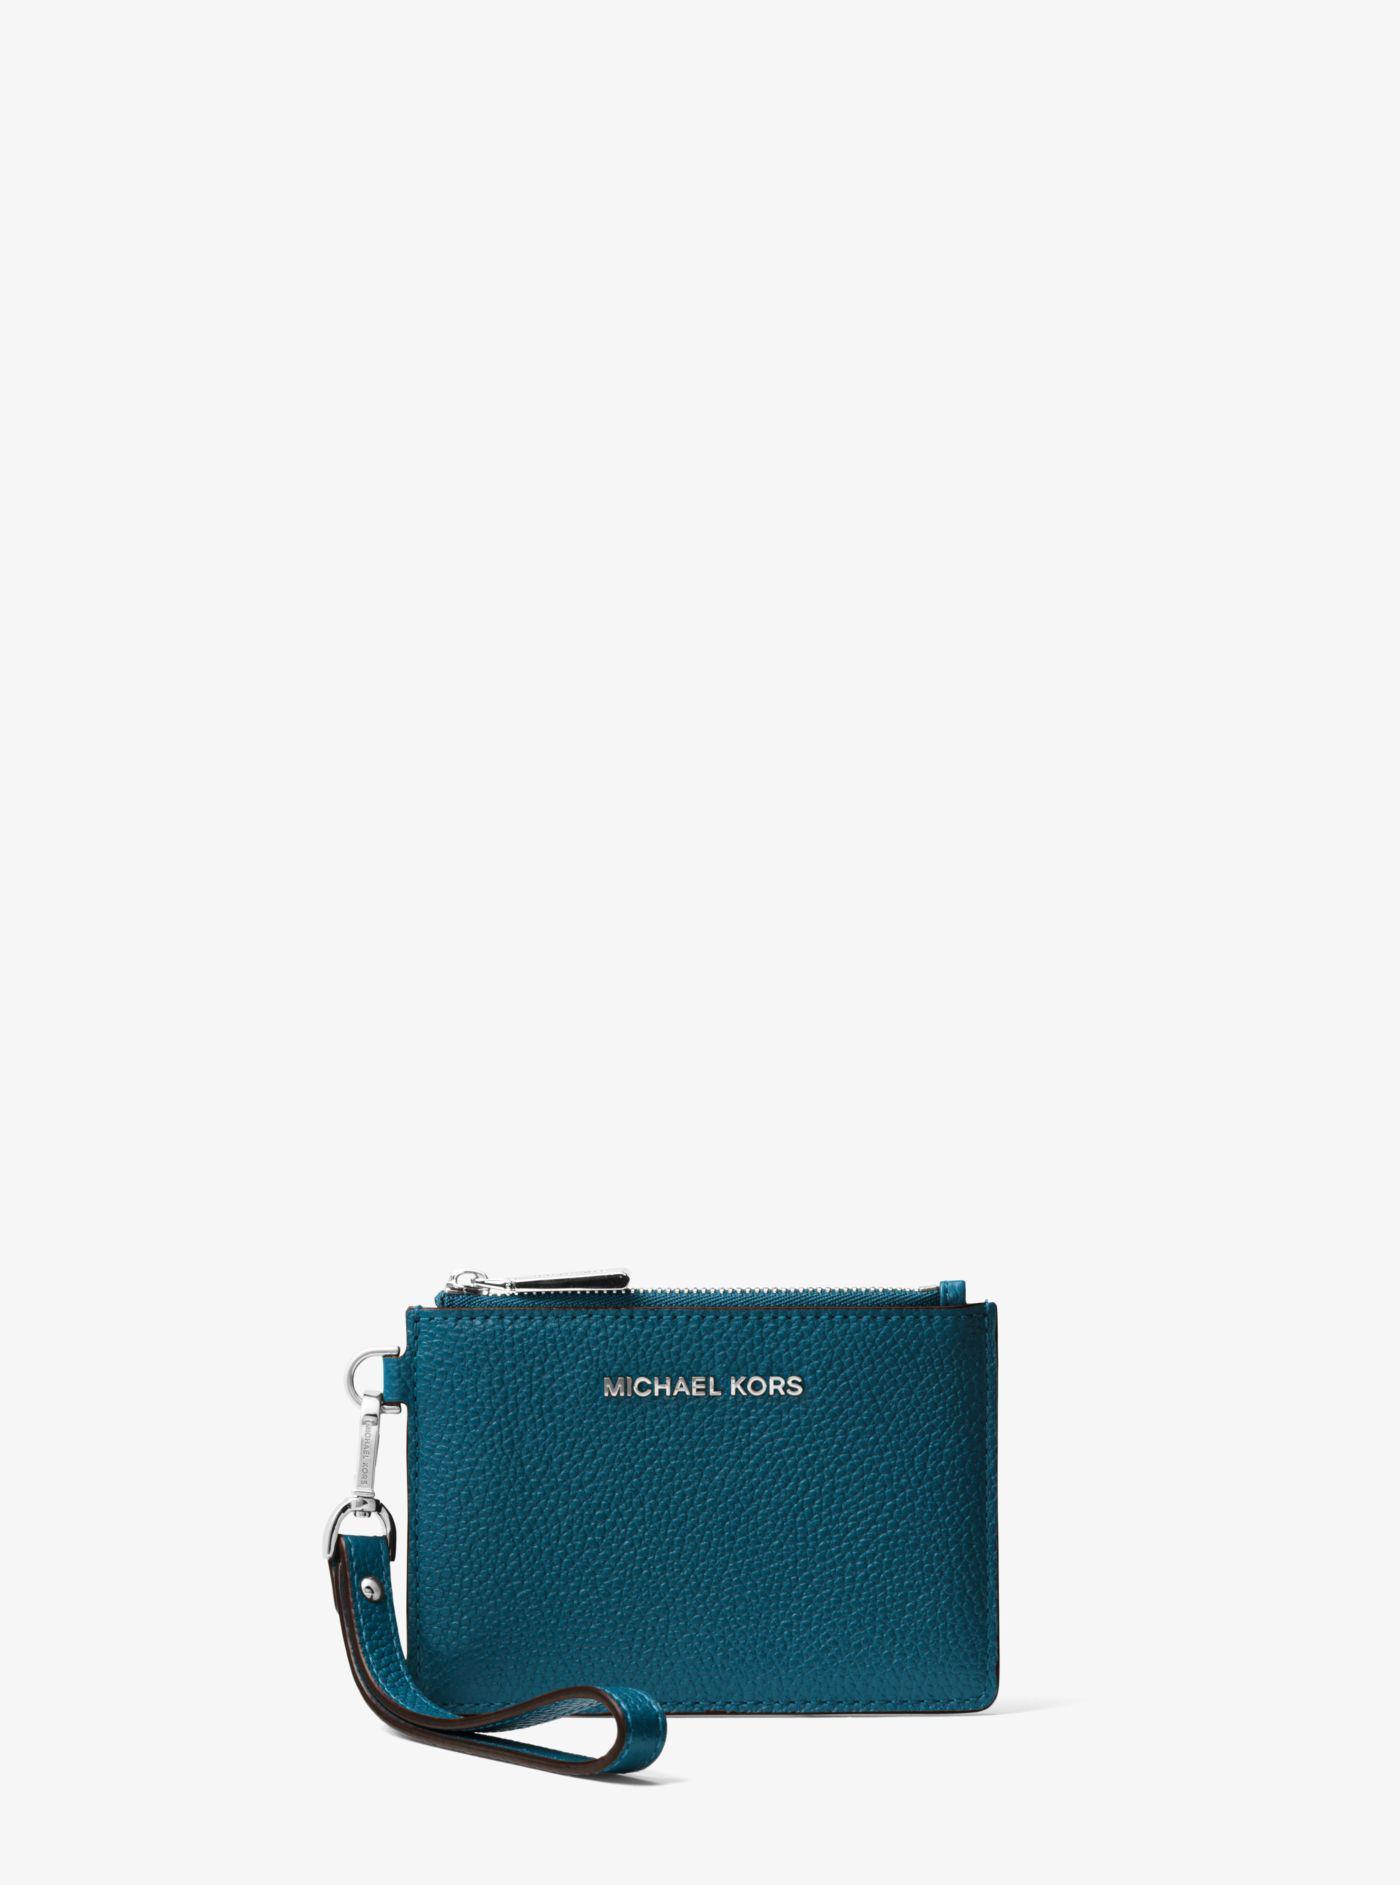 2c5a074c3022e Michael Kors - Multicolor Leather Coin Purse - Lyst. View fullscreen